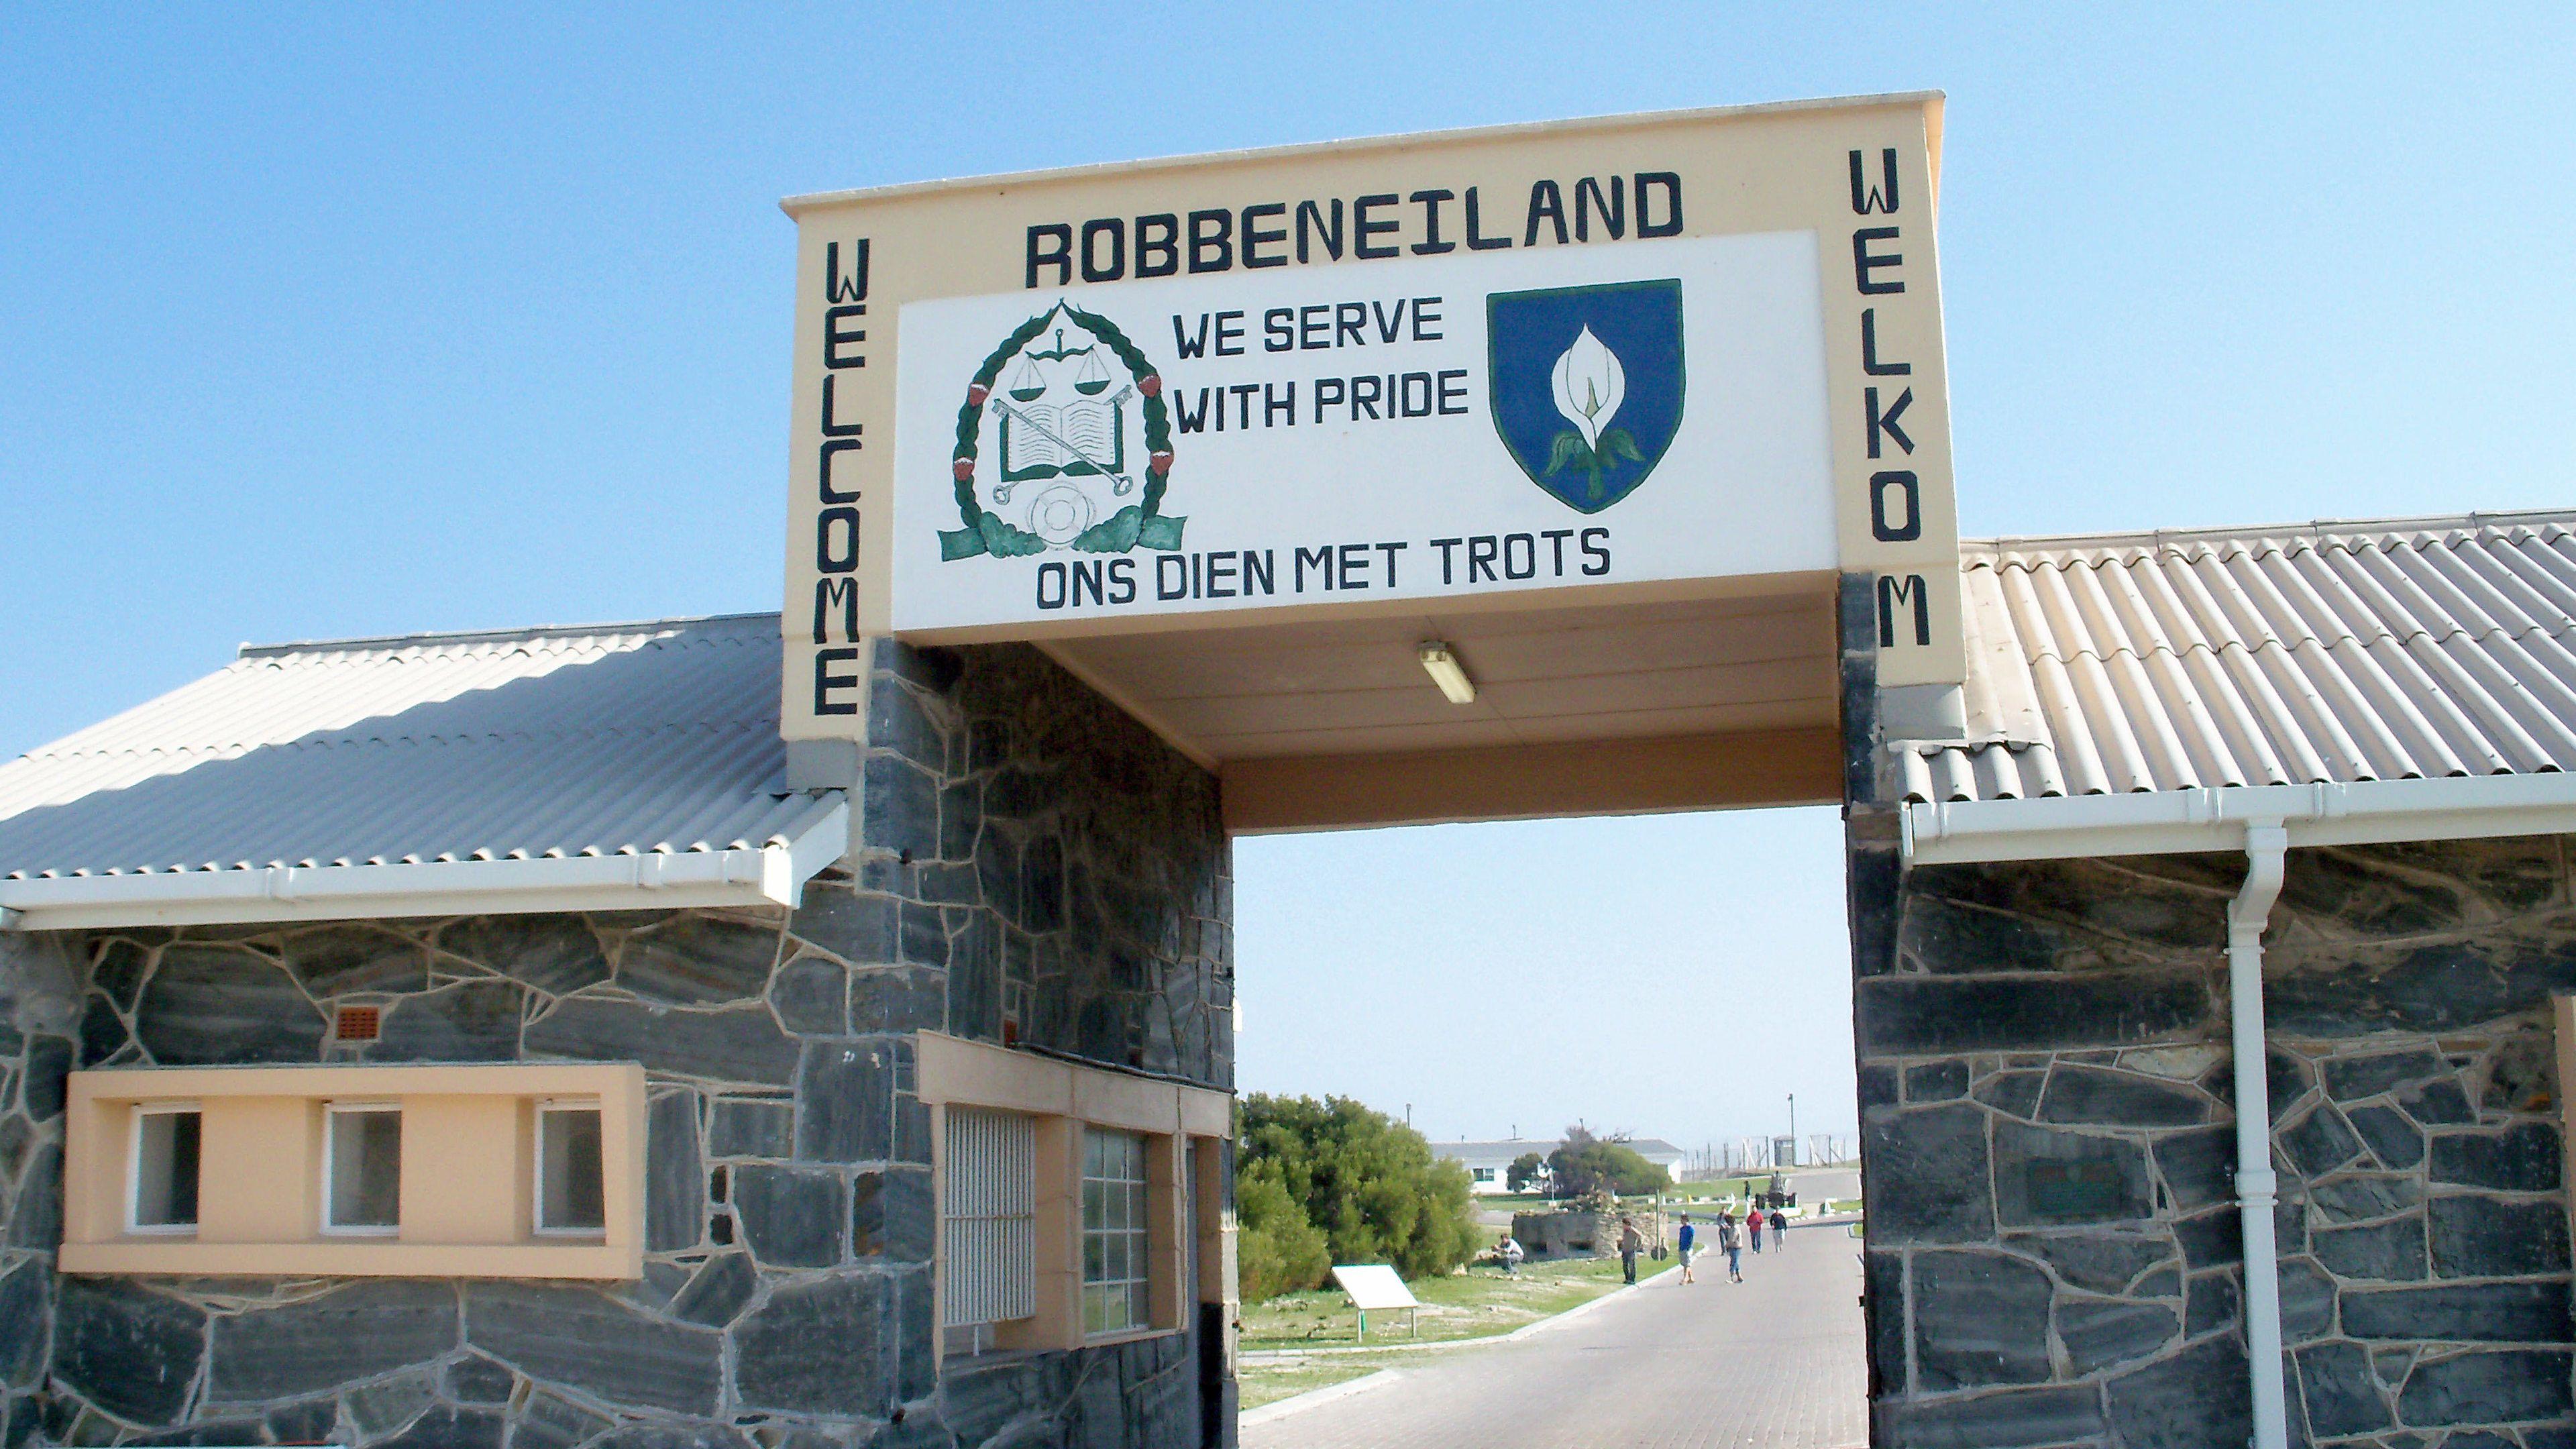 Robben Island, where Nelson Mandela was incarcerated